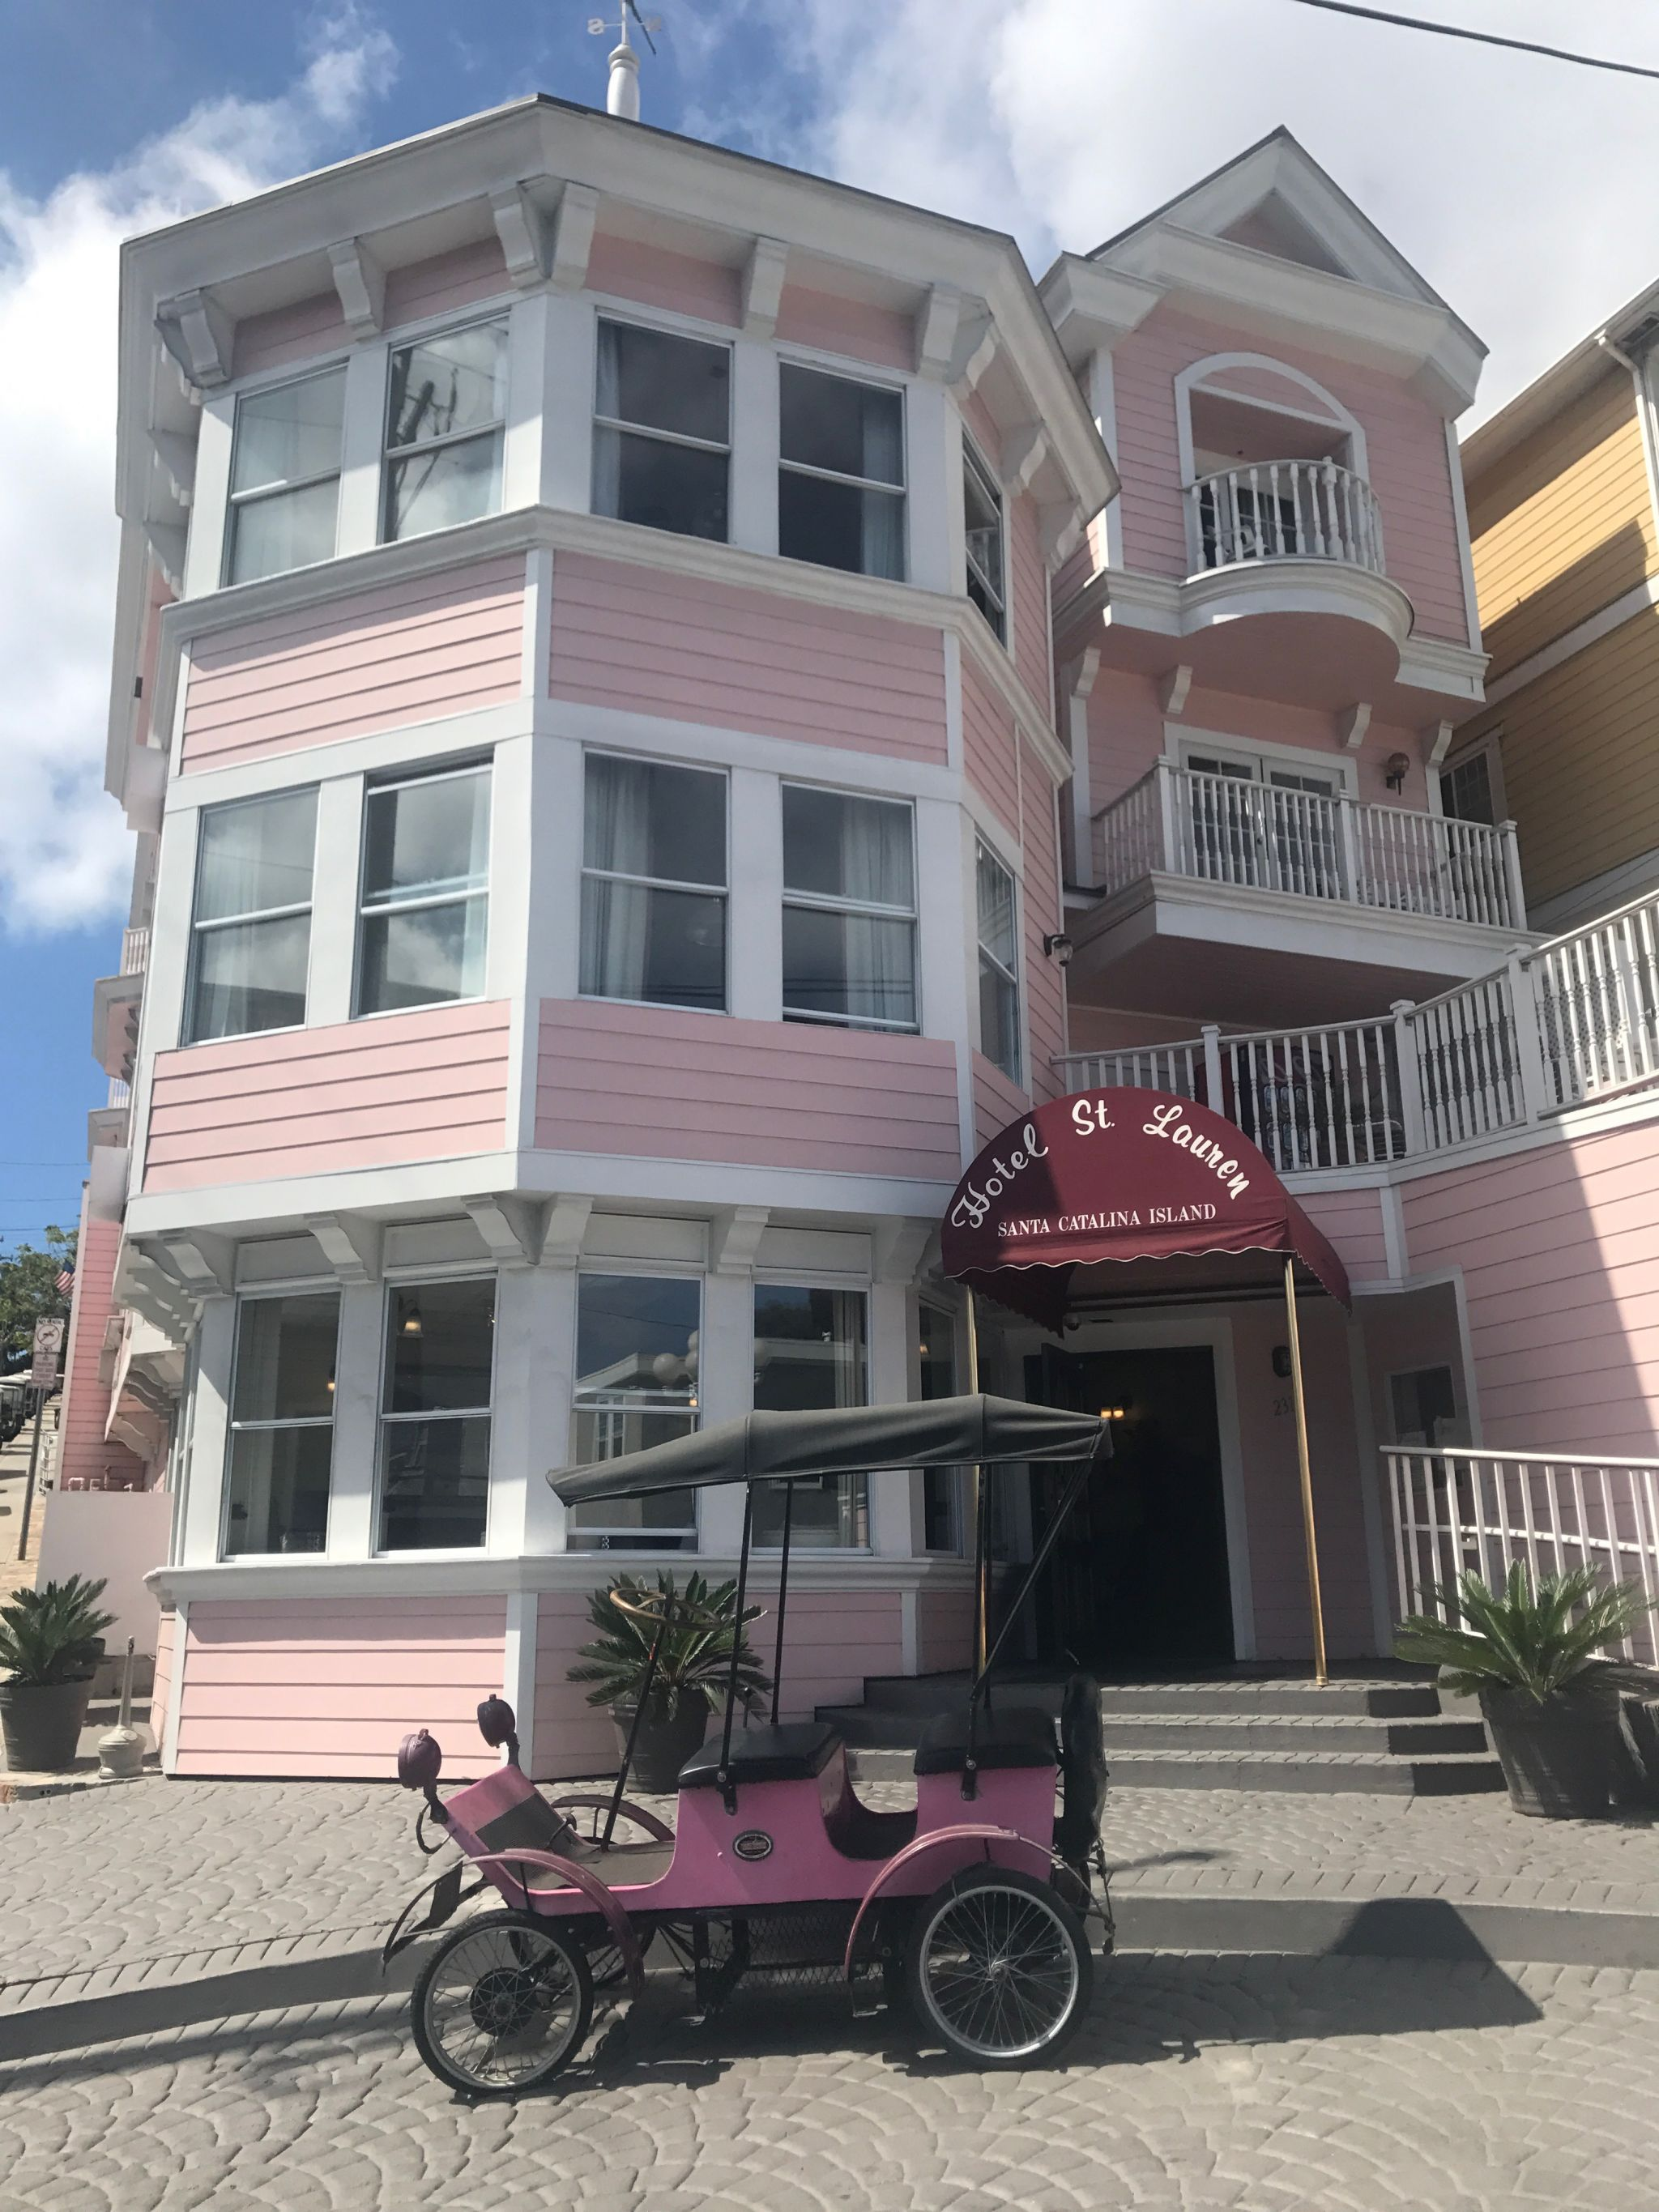 Hotel St. Lauren Catalina Island